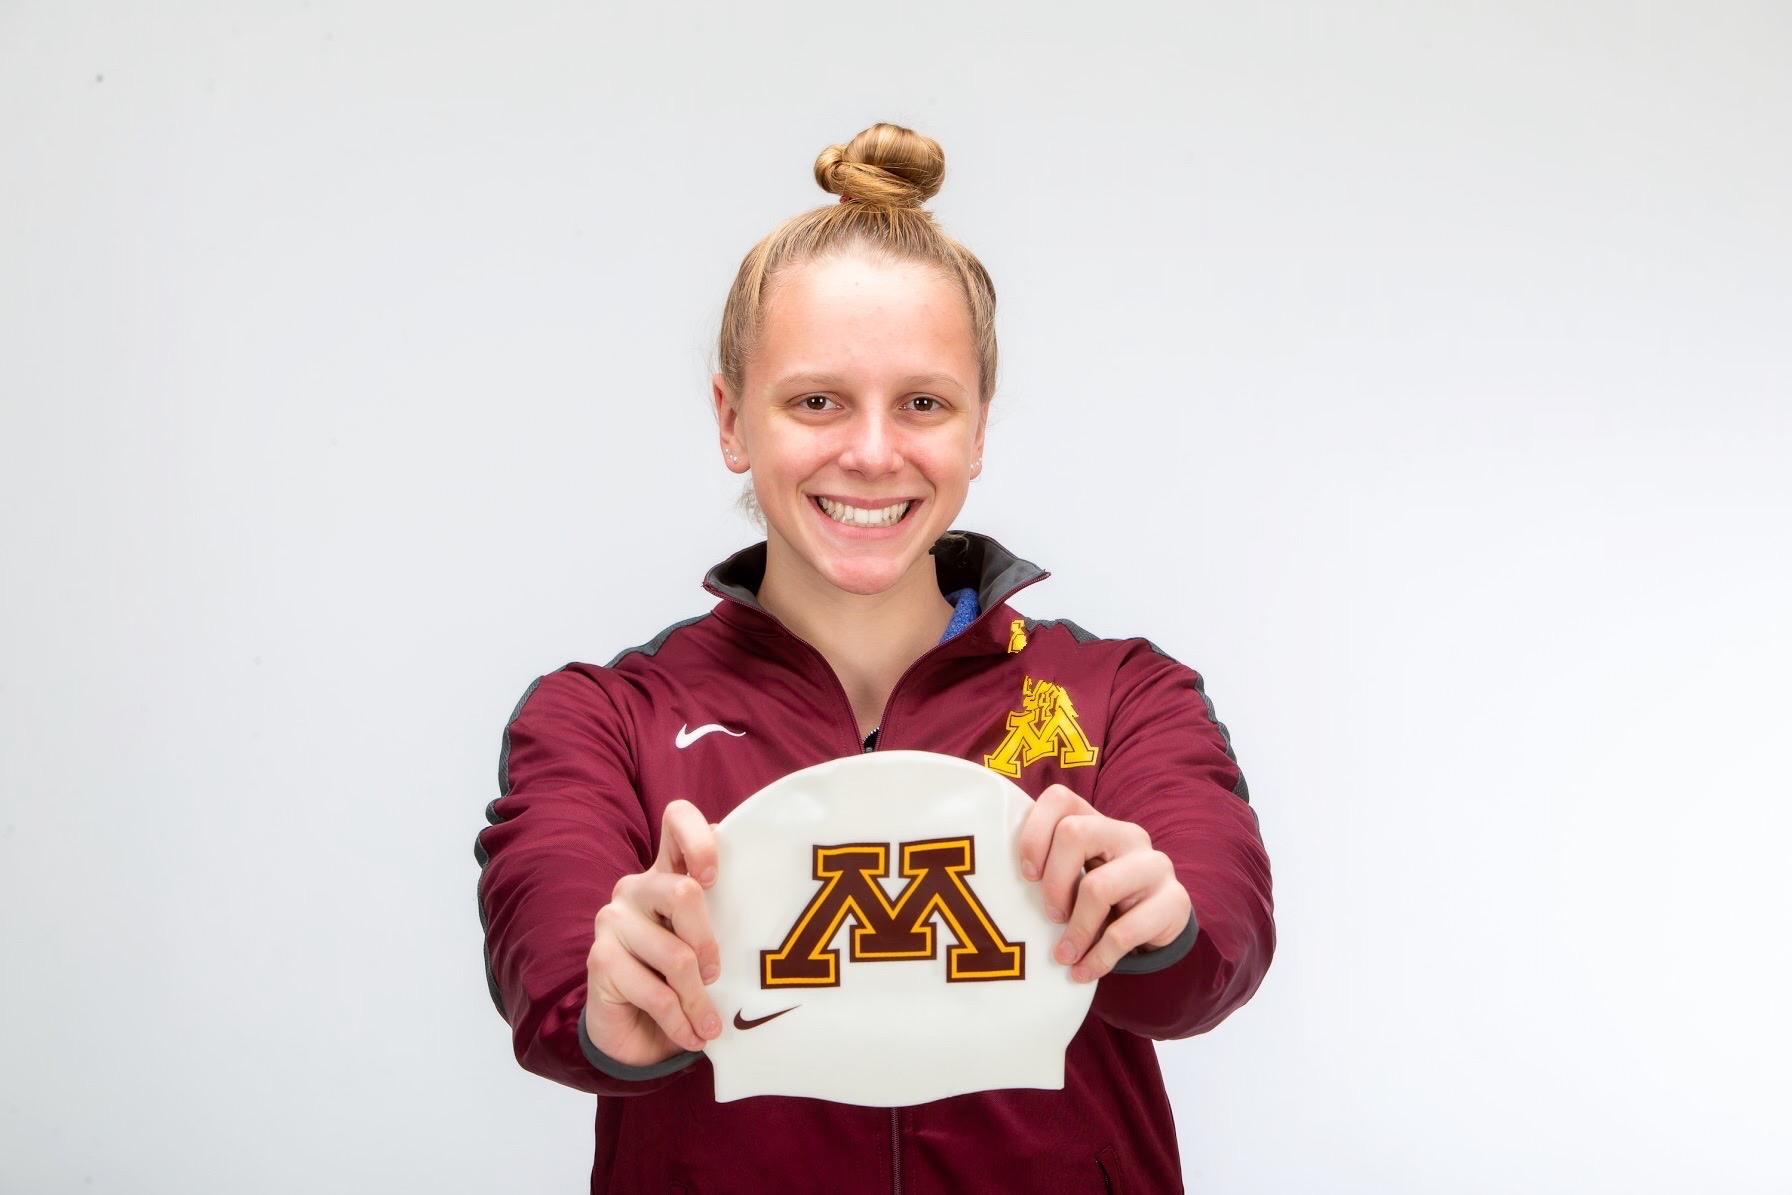 Canadian Sprint Specialist Hannah Cornish to Minnesota for 2021-22